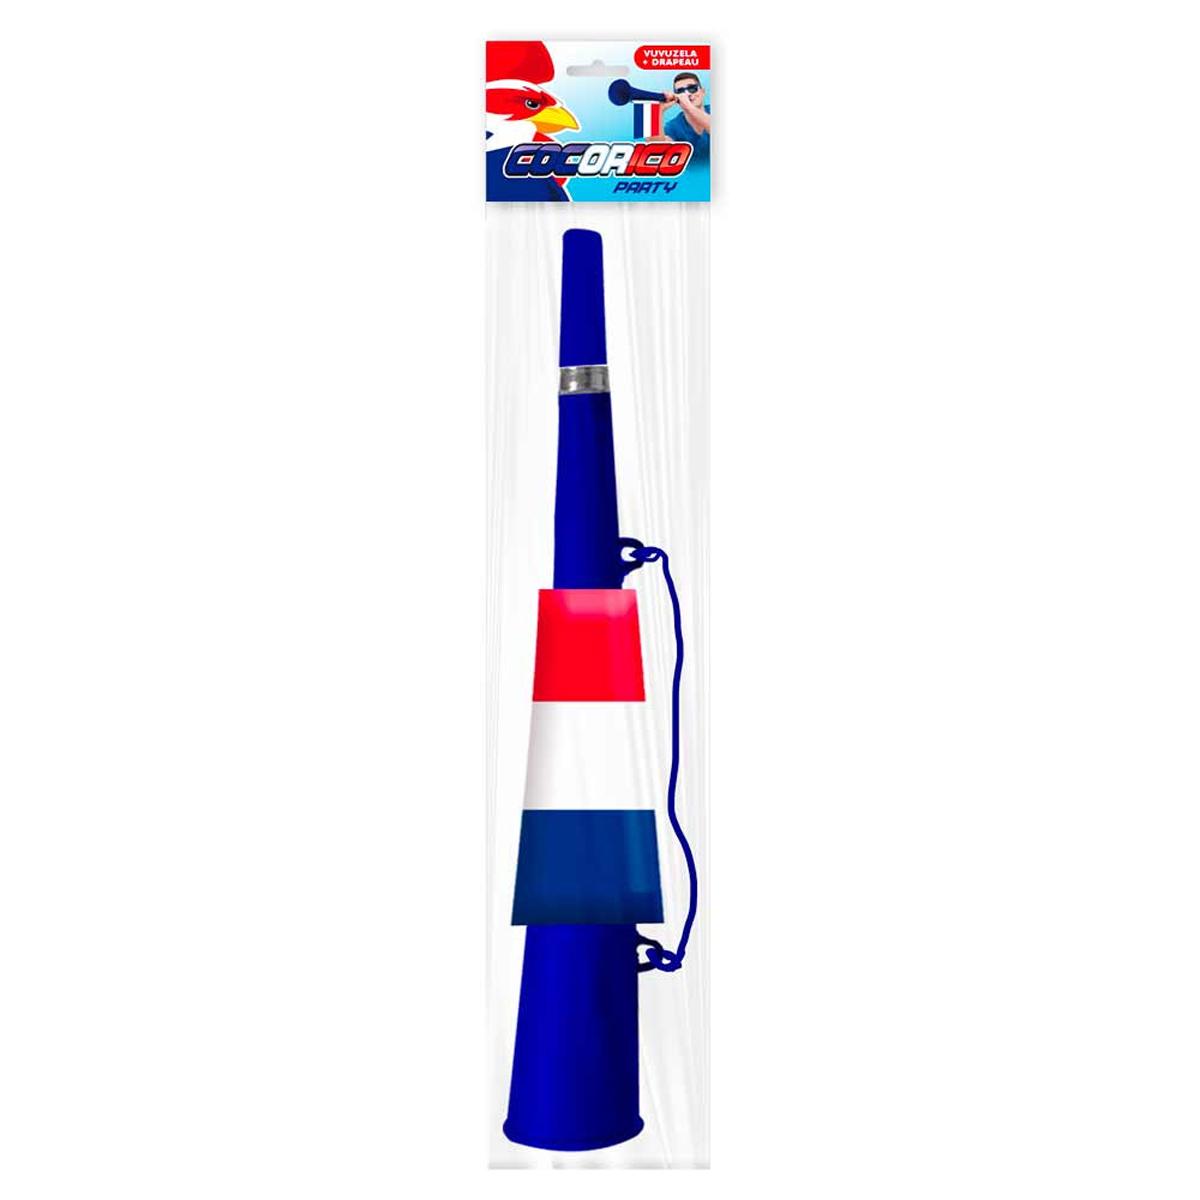 Vuvuzela \'France Cocorico\' tricolore - 44x11 cm - [R2100]